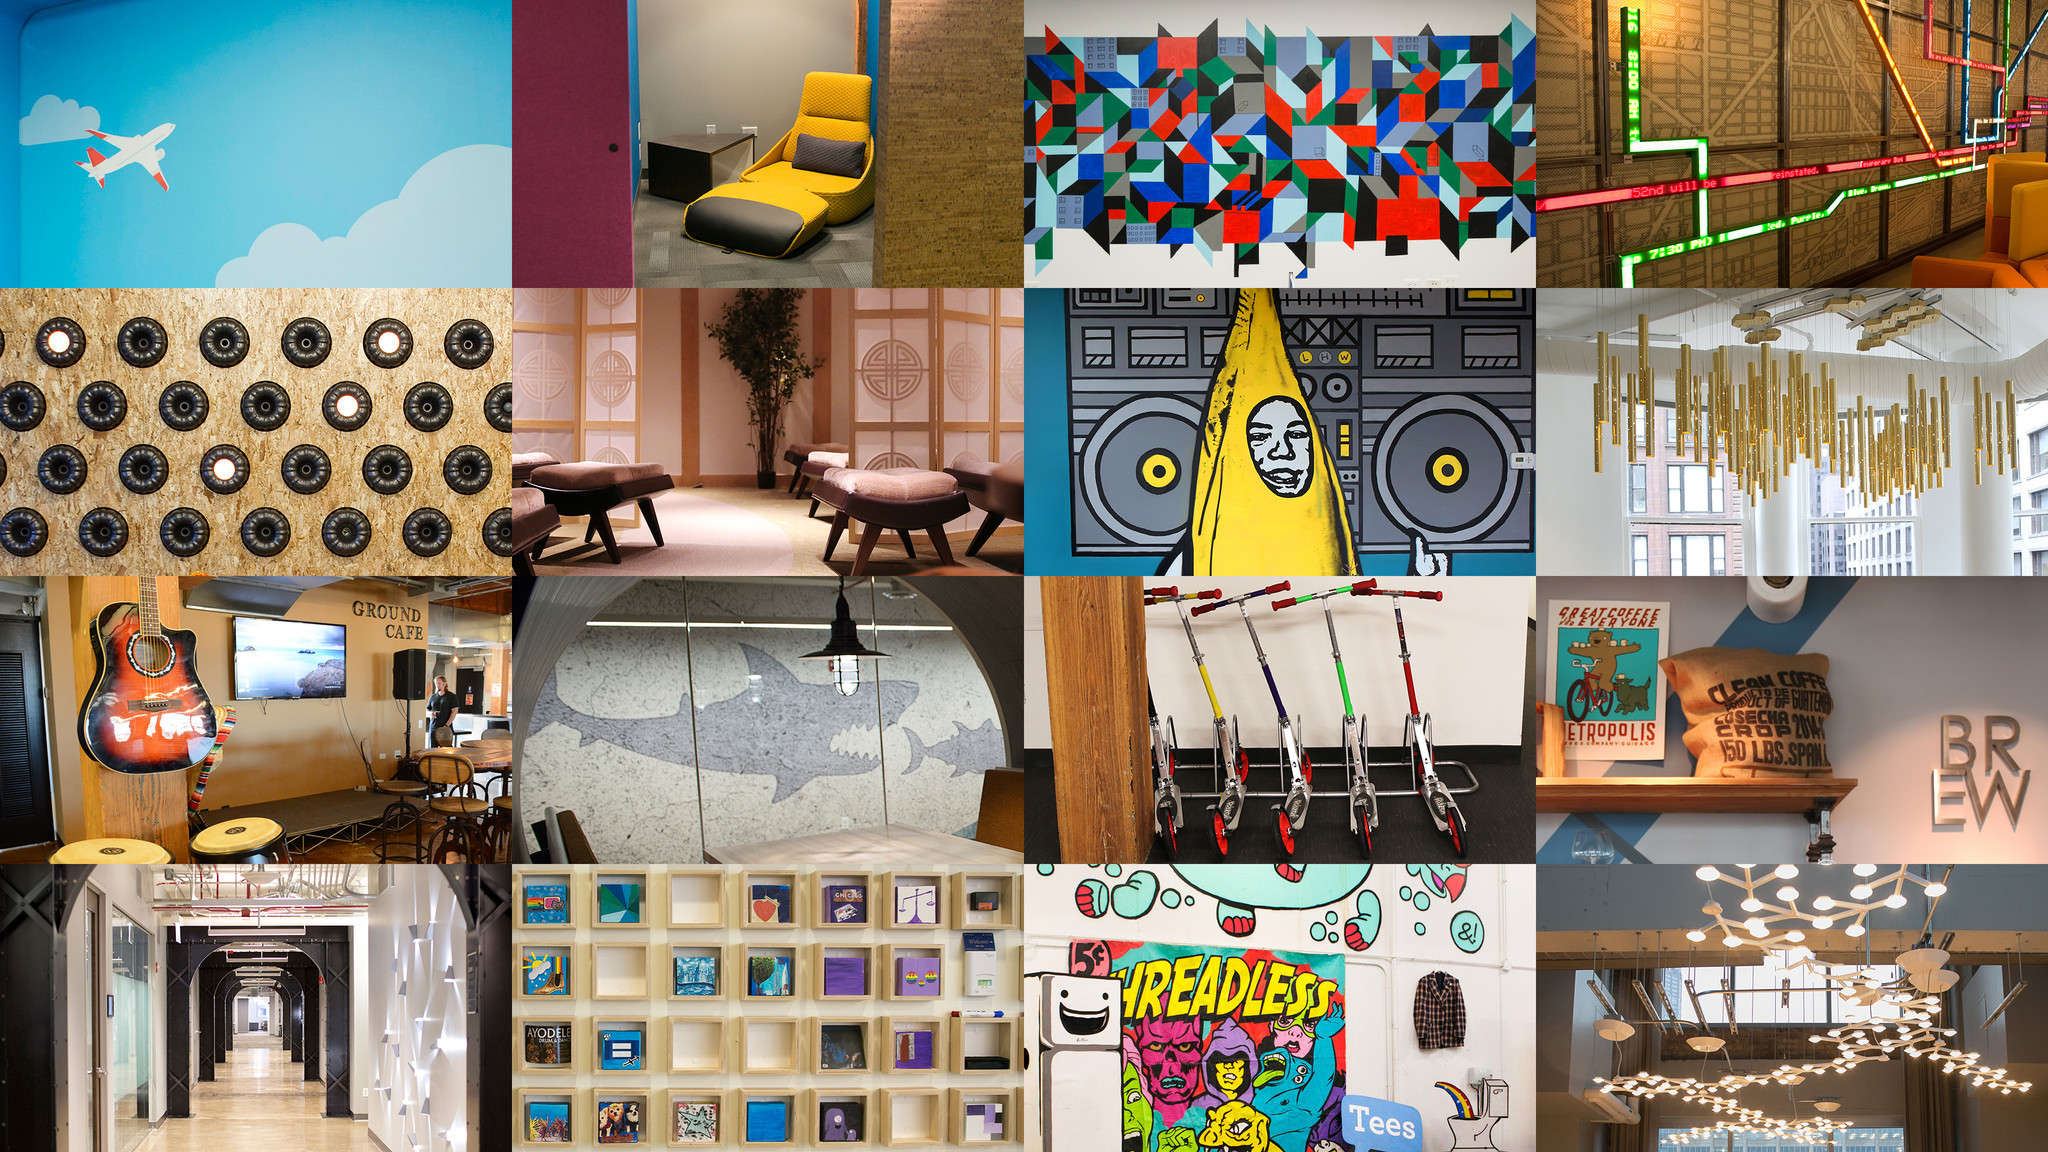 5 Designers Predict Future Of Office Spaces